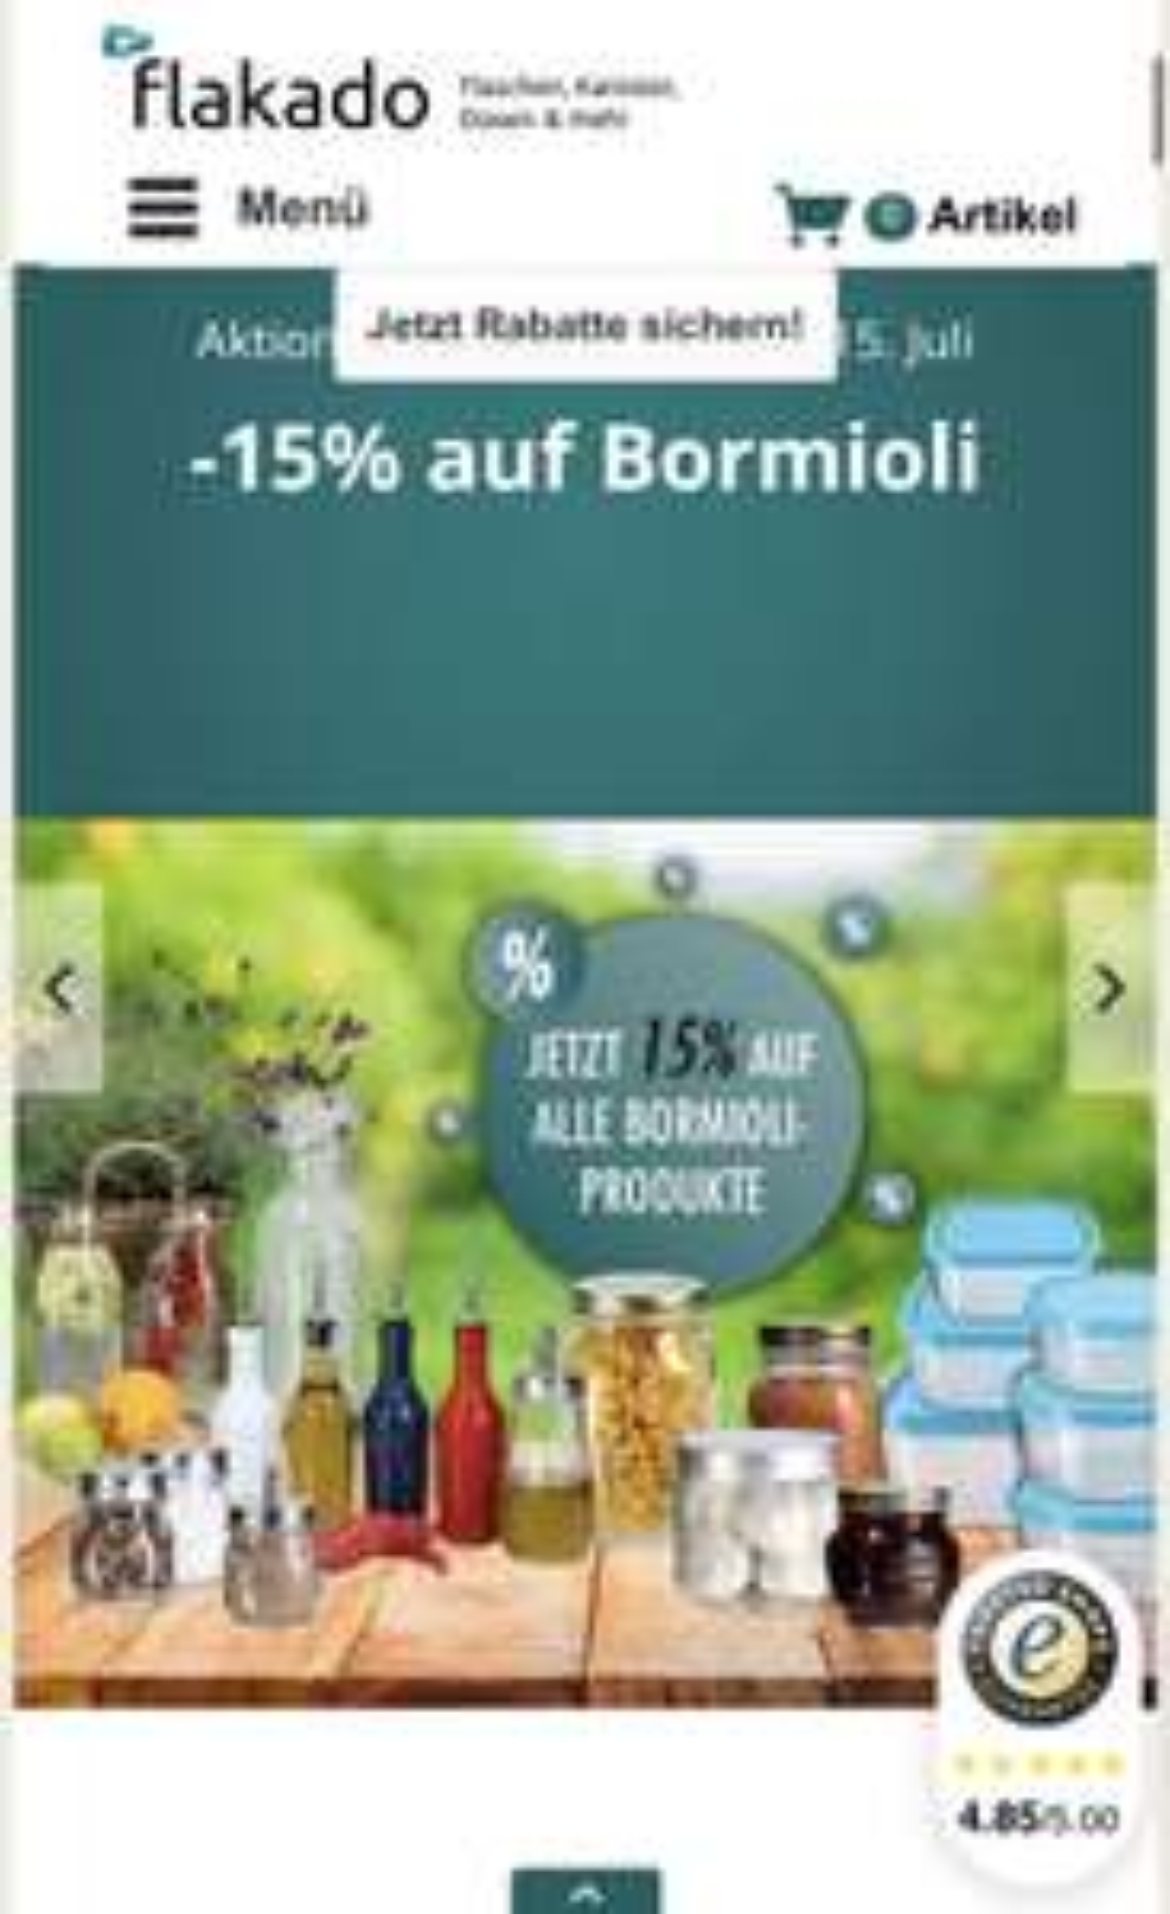 15% auf Bormioli Artikel